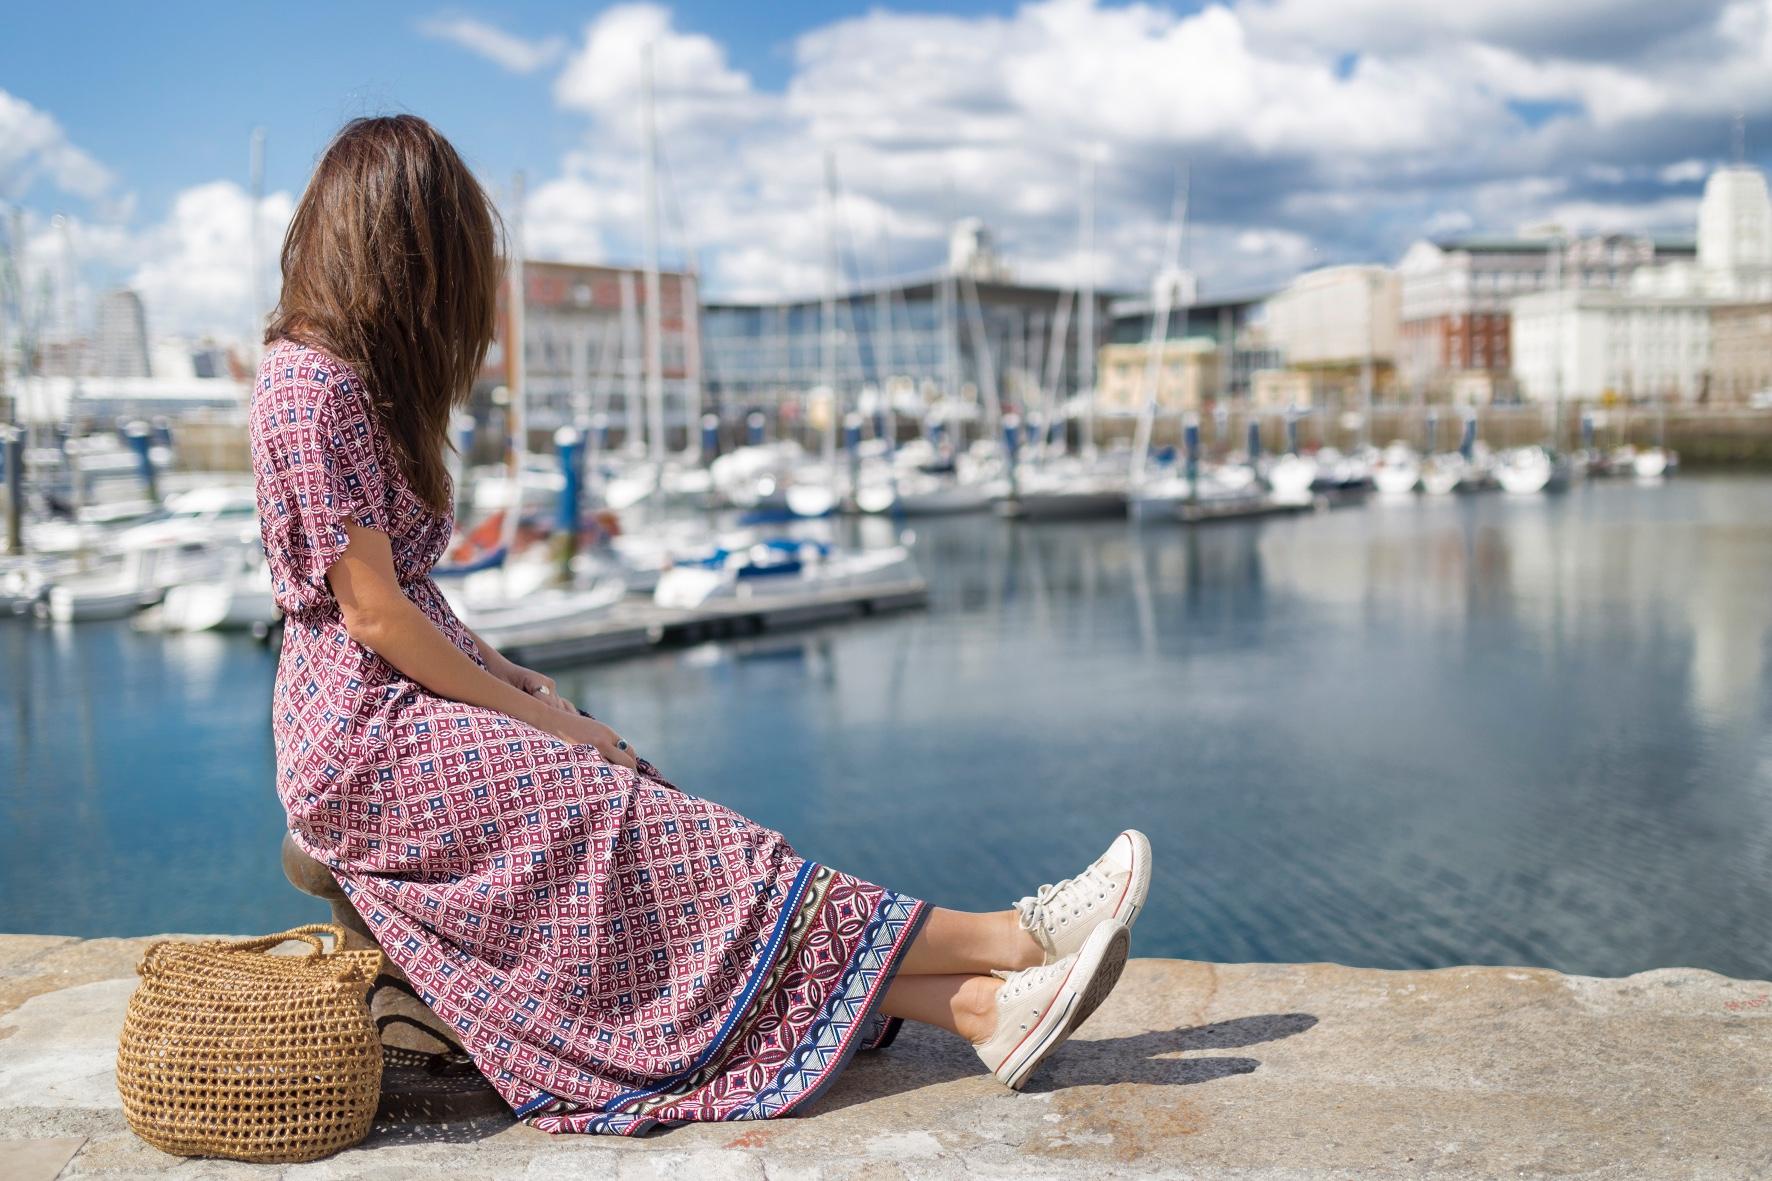 alba cuesta-fashion-moda-blogger-C&A dress- bolso de mimbre- vestido largo- C and A- descalzaporelparque